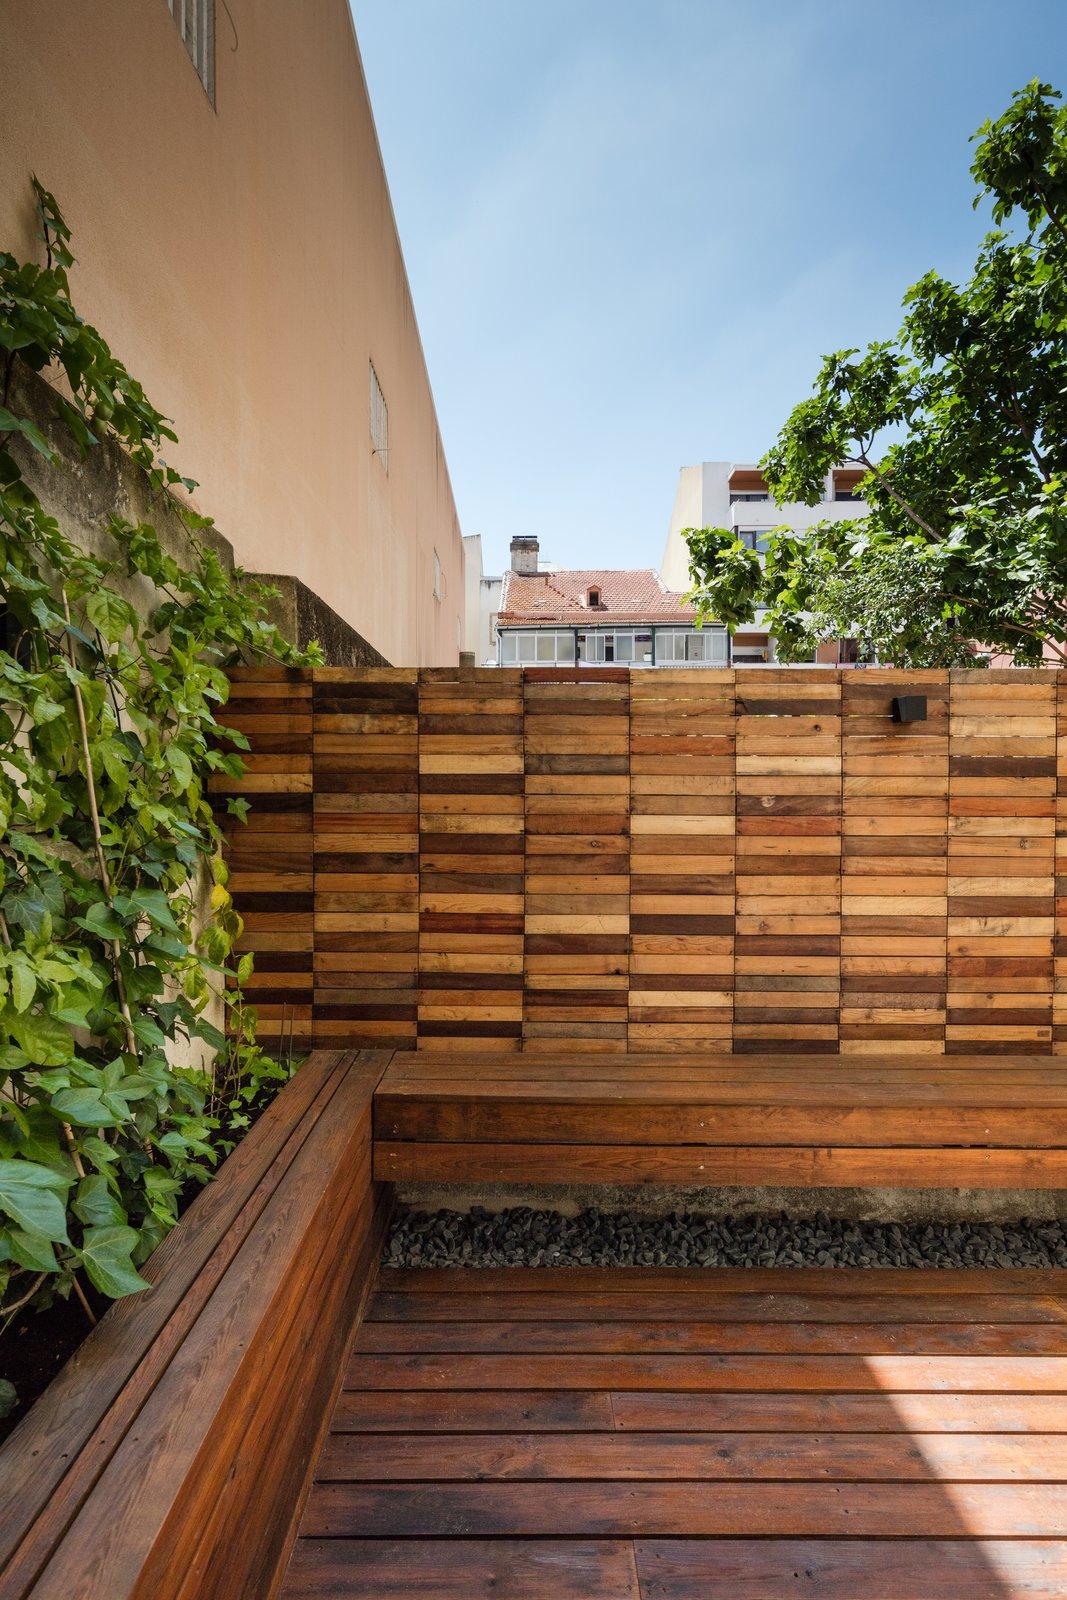 Outdoor, Back Yard, Wood Patio, Porch, Deck, Small Patio, Porch, Deck, Horizontal Fences, Wall, and Wood Fences, Wall  Rua Maria Loft